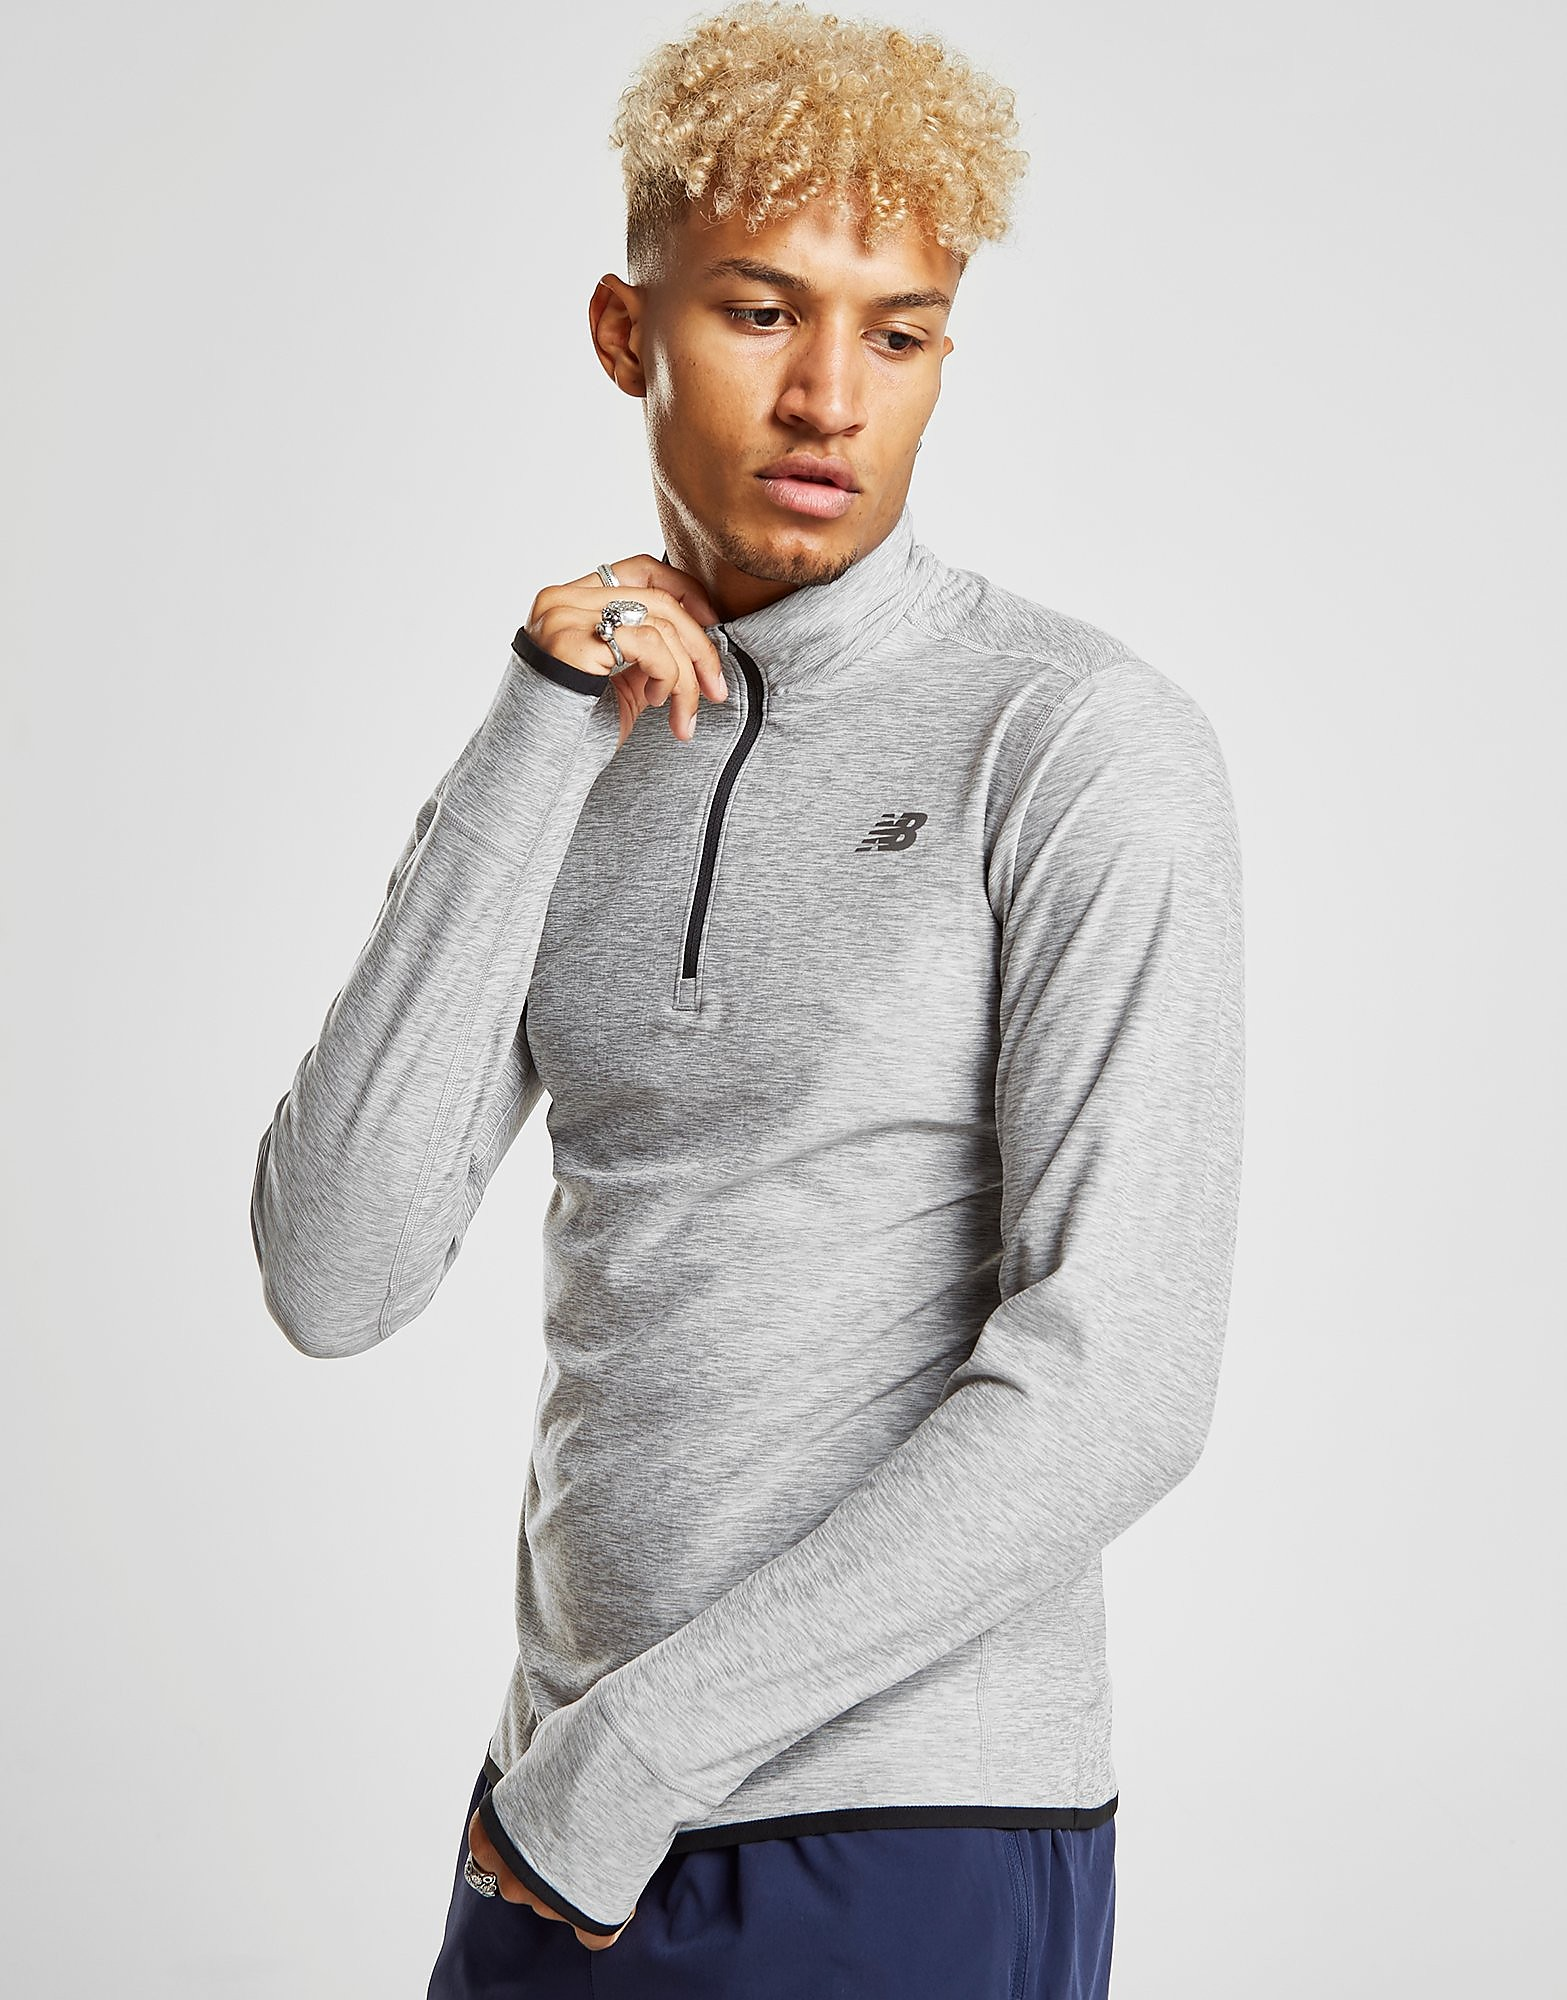 New Balance Transit 1/4 Zip Top - Grey, Grey